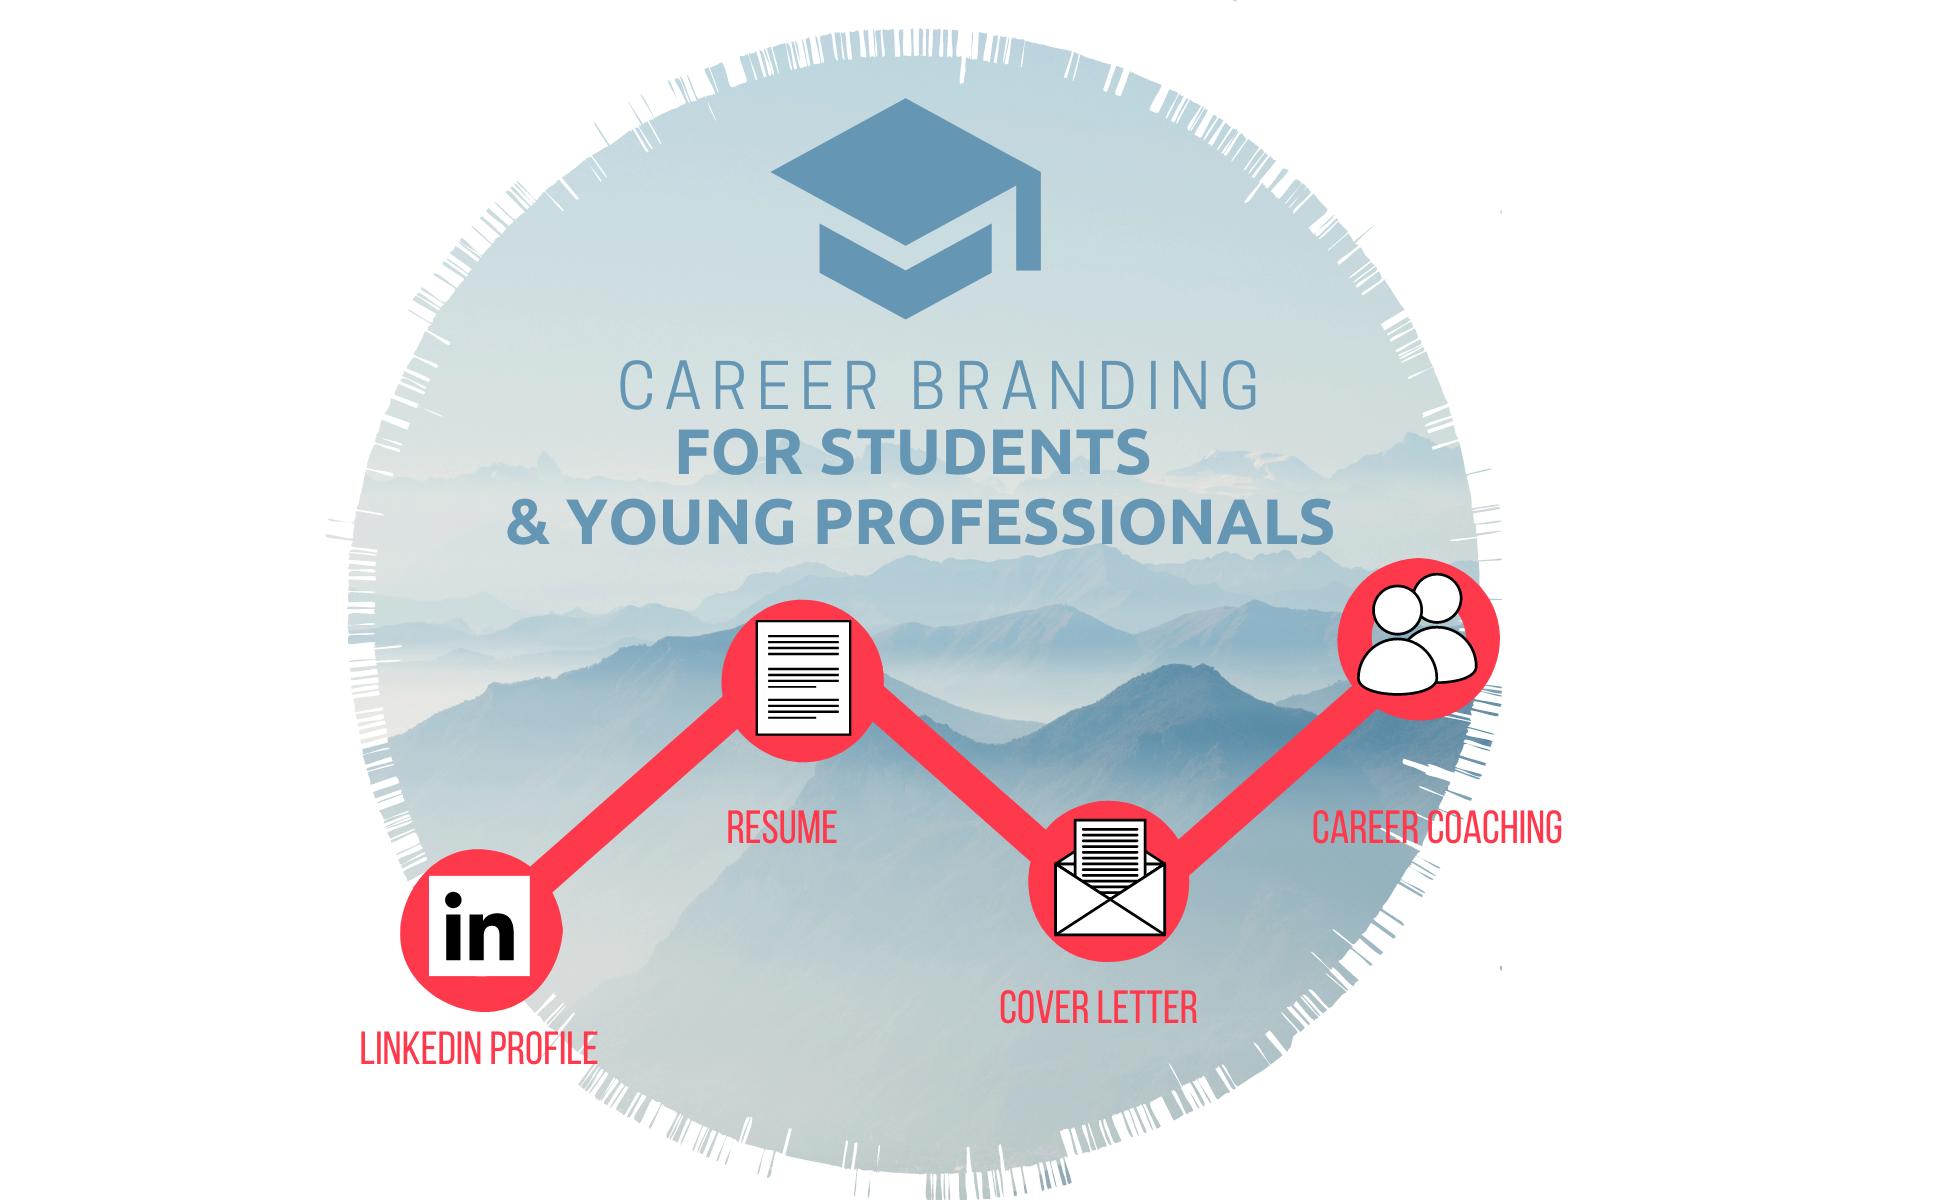 Career Branding Services